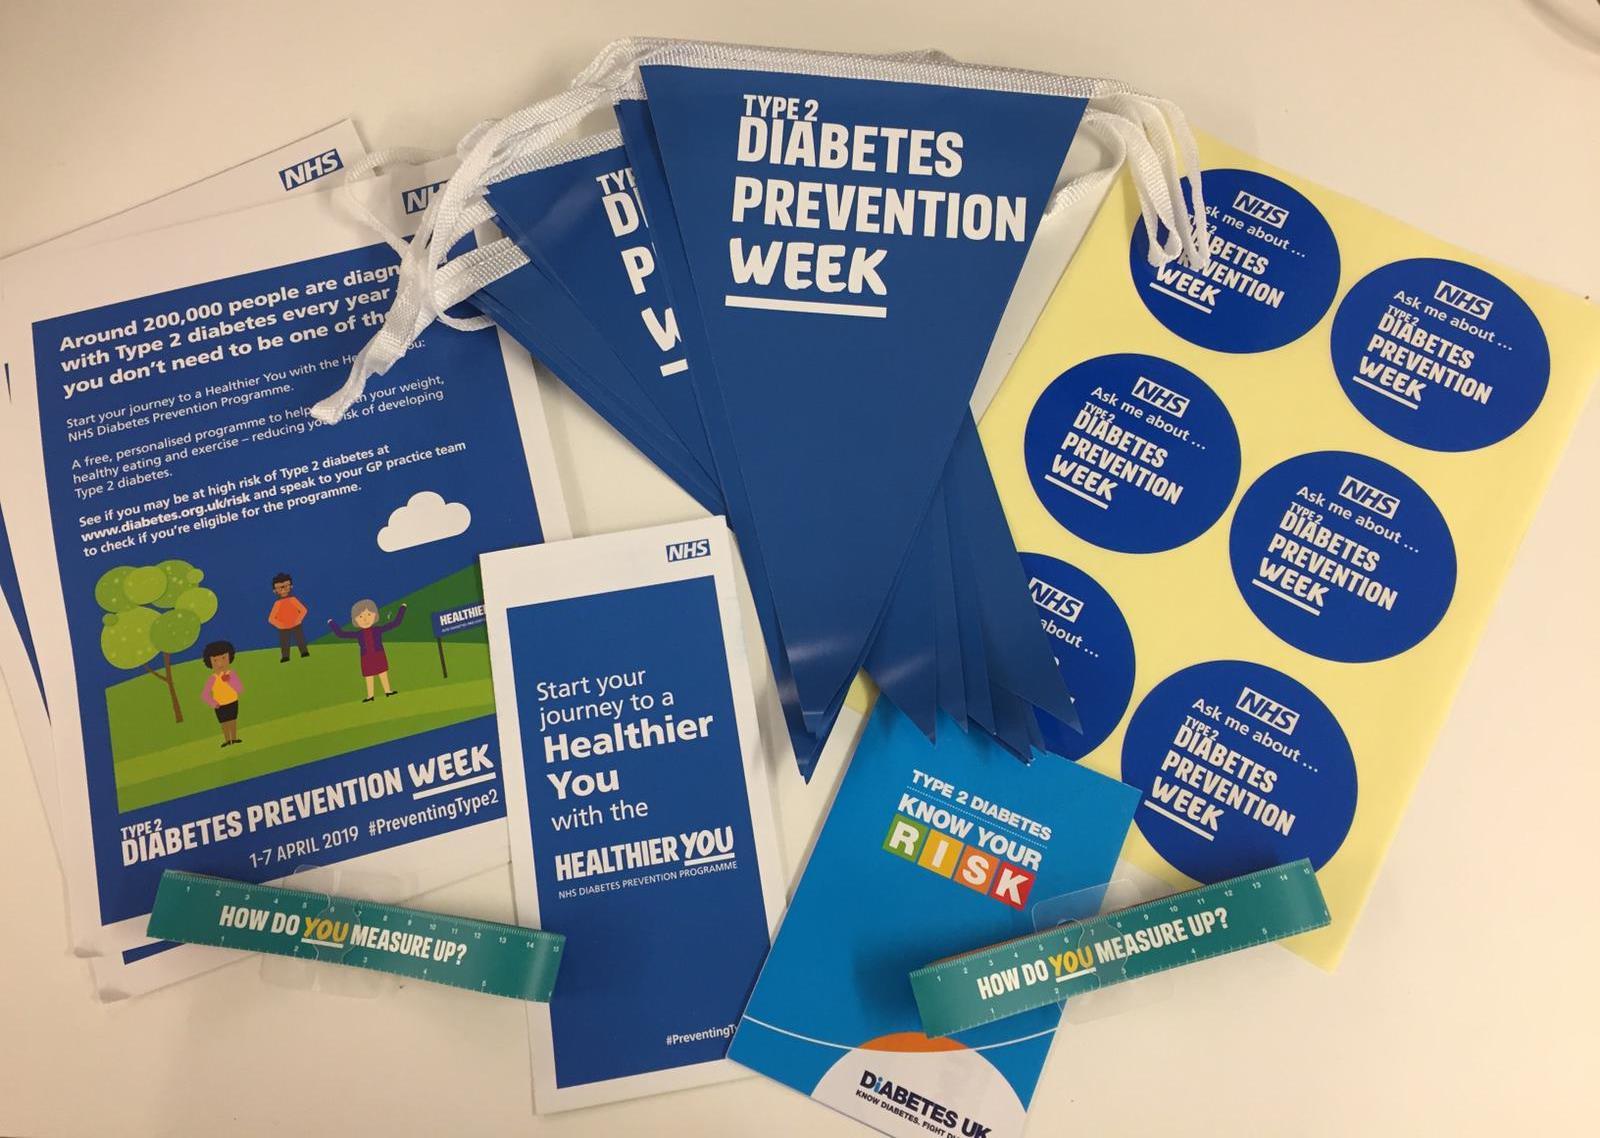 Type 2 Diabetes Prevention Week image